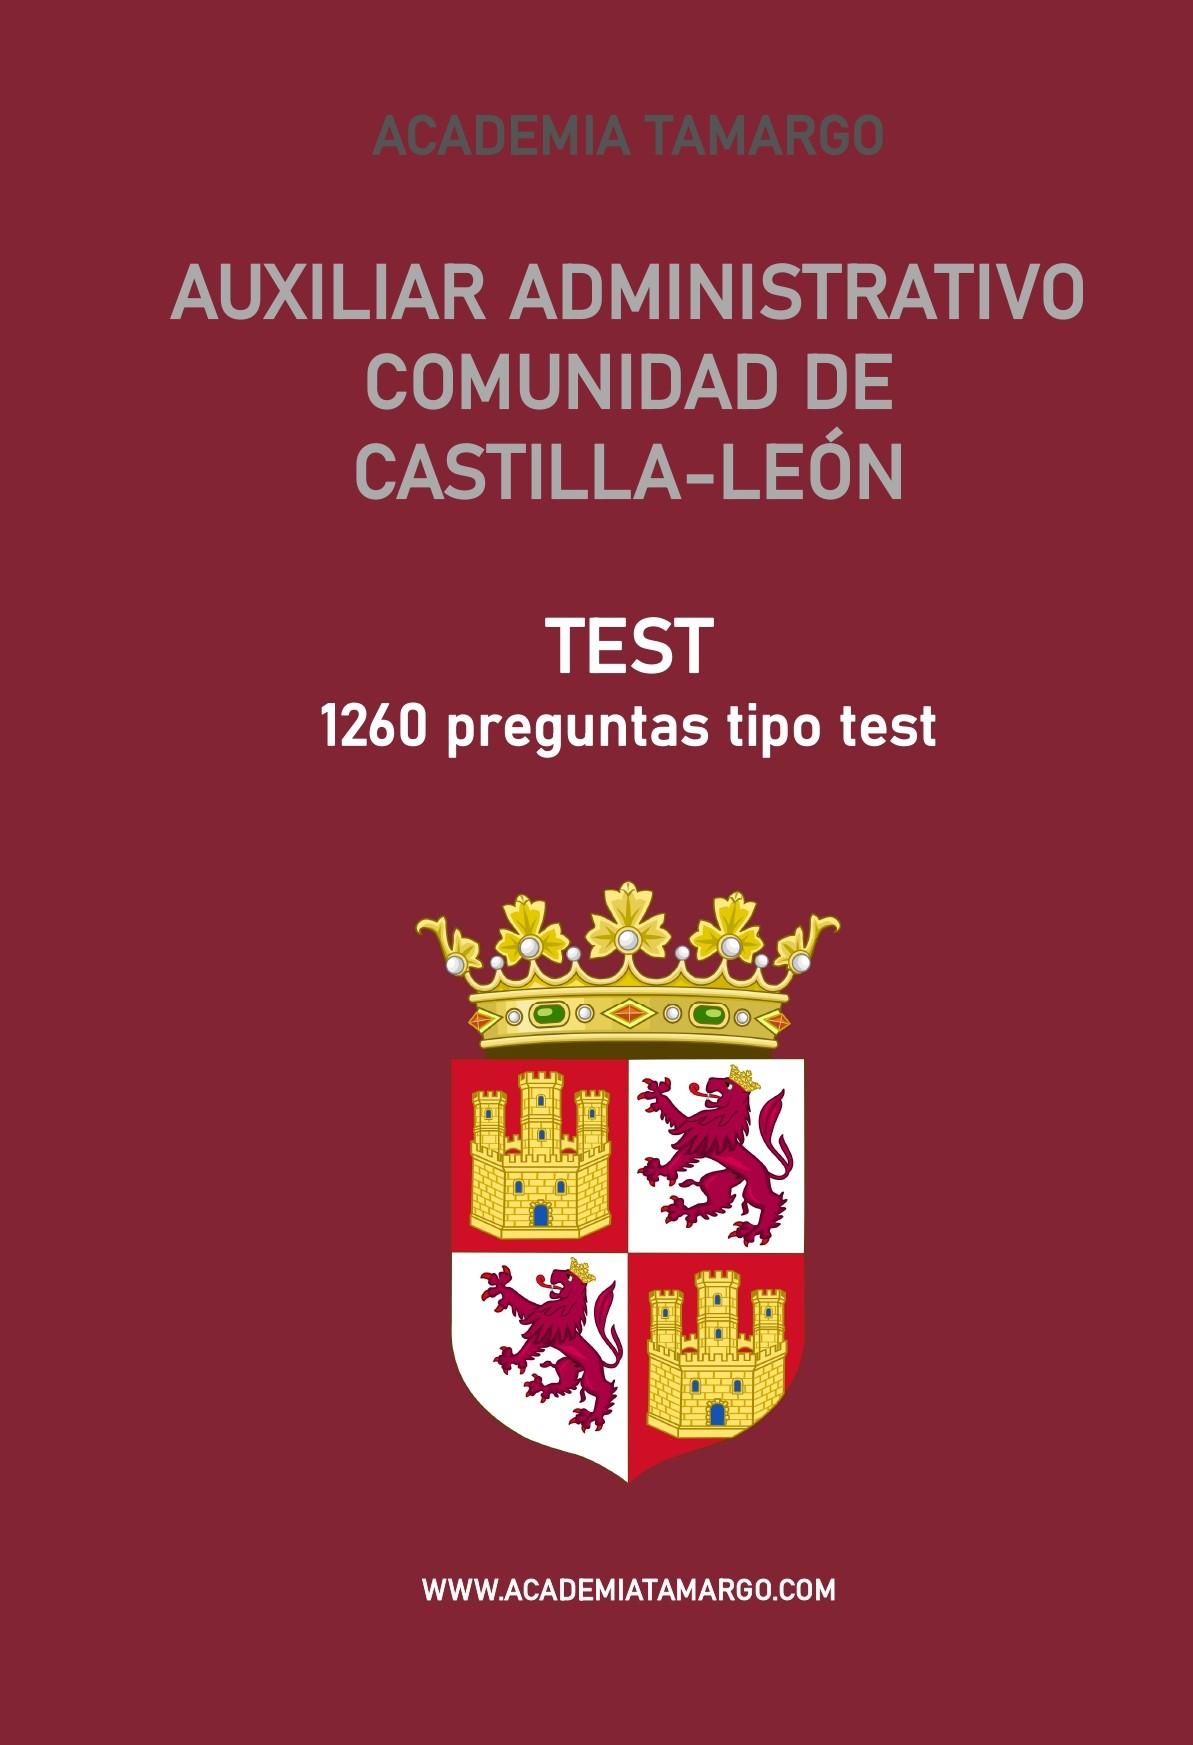 PORTADA TEST AUXILIAR ADMINISTRATIVO CASTILLA Y LEON_page-0001